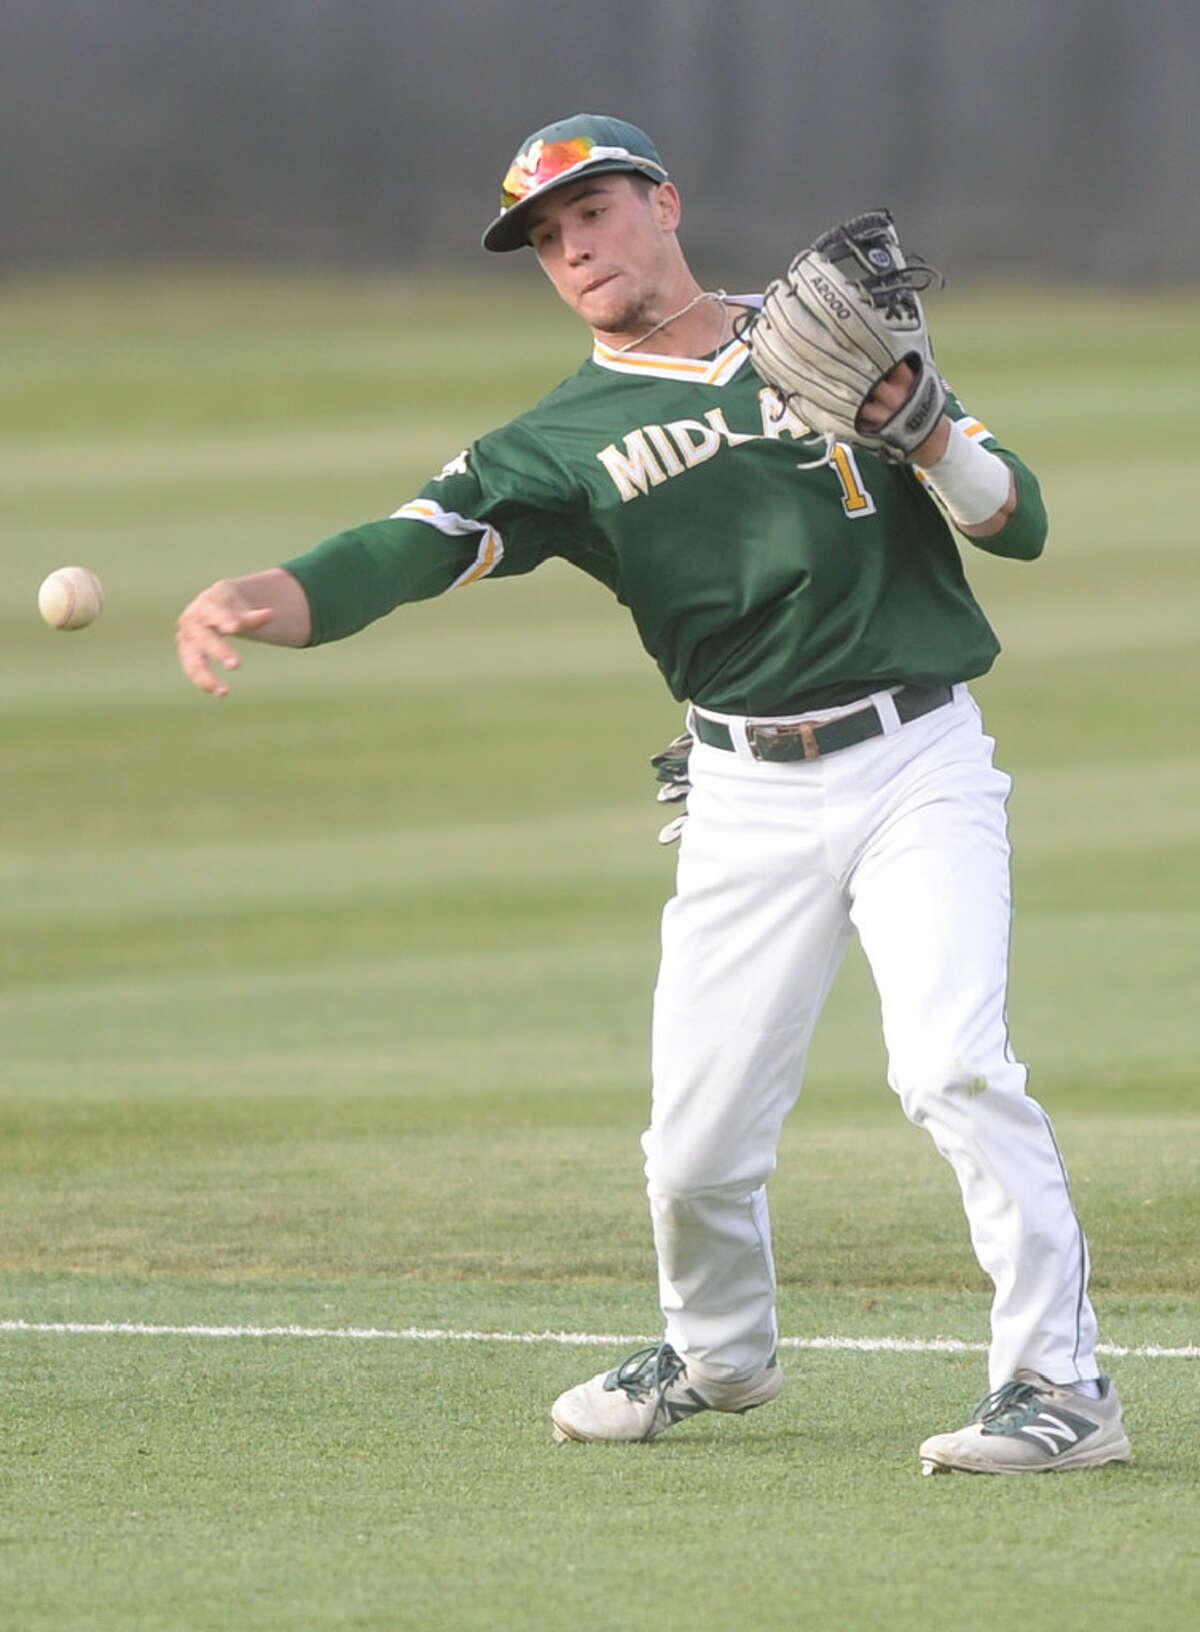 Midland College's Riley King (1) makes a play against Odessa College on Wednesday, March 29, 2017, at Christensen Stadium. James Durbin/Reporter-Telegram